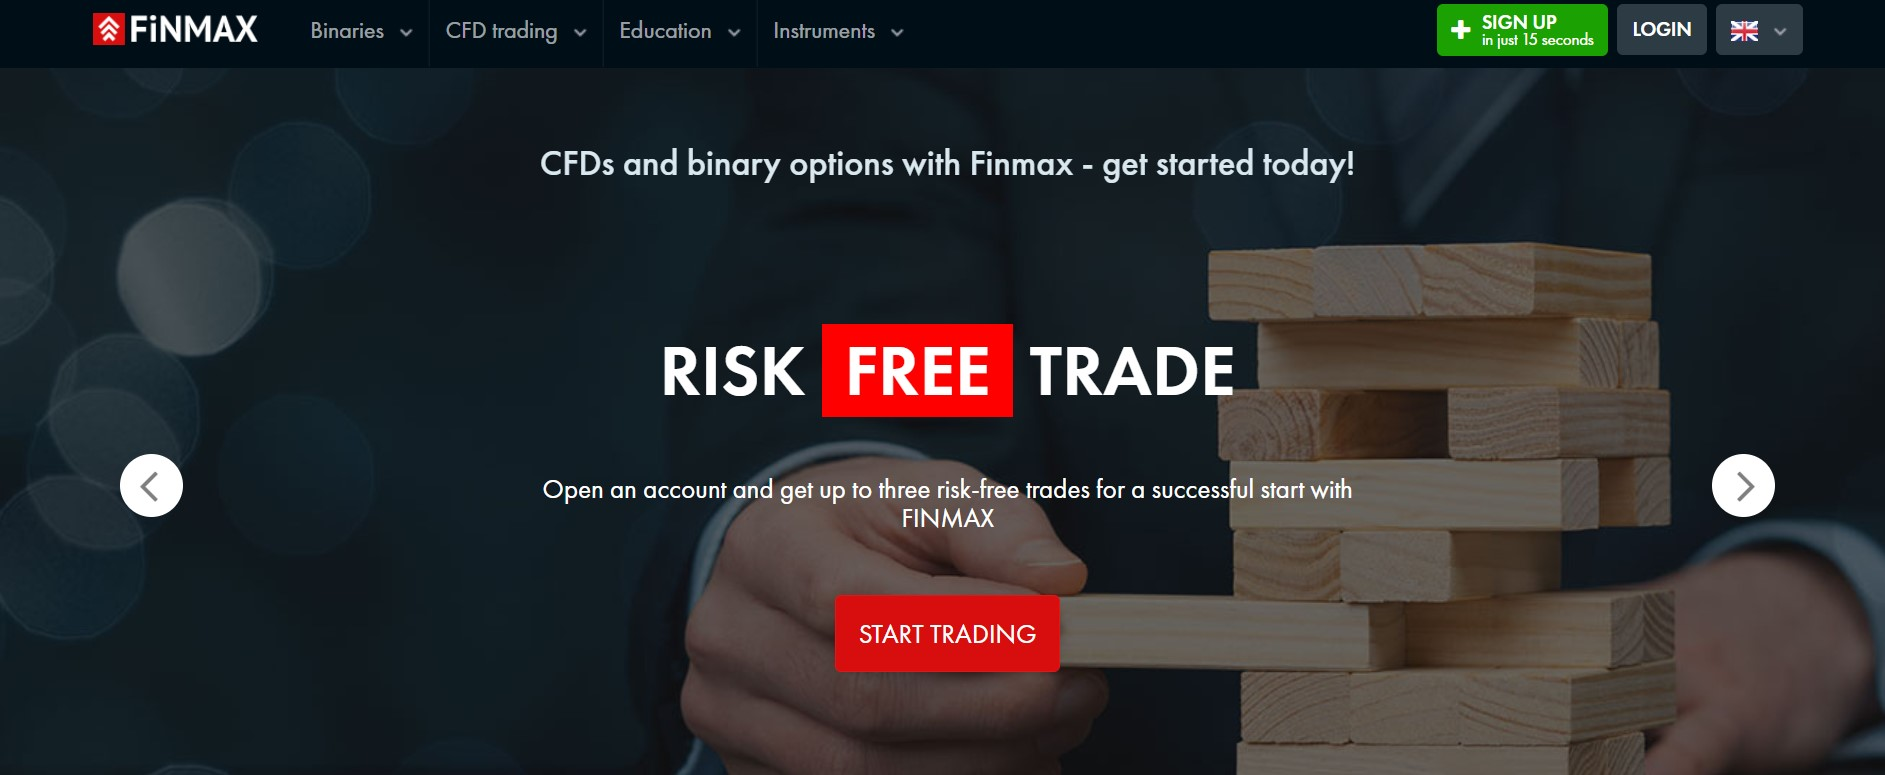 FiNMAX website